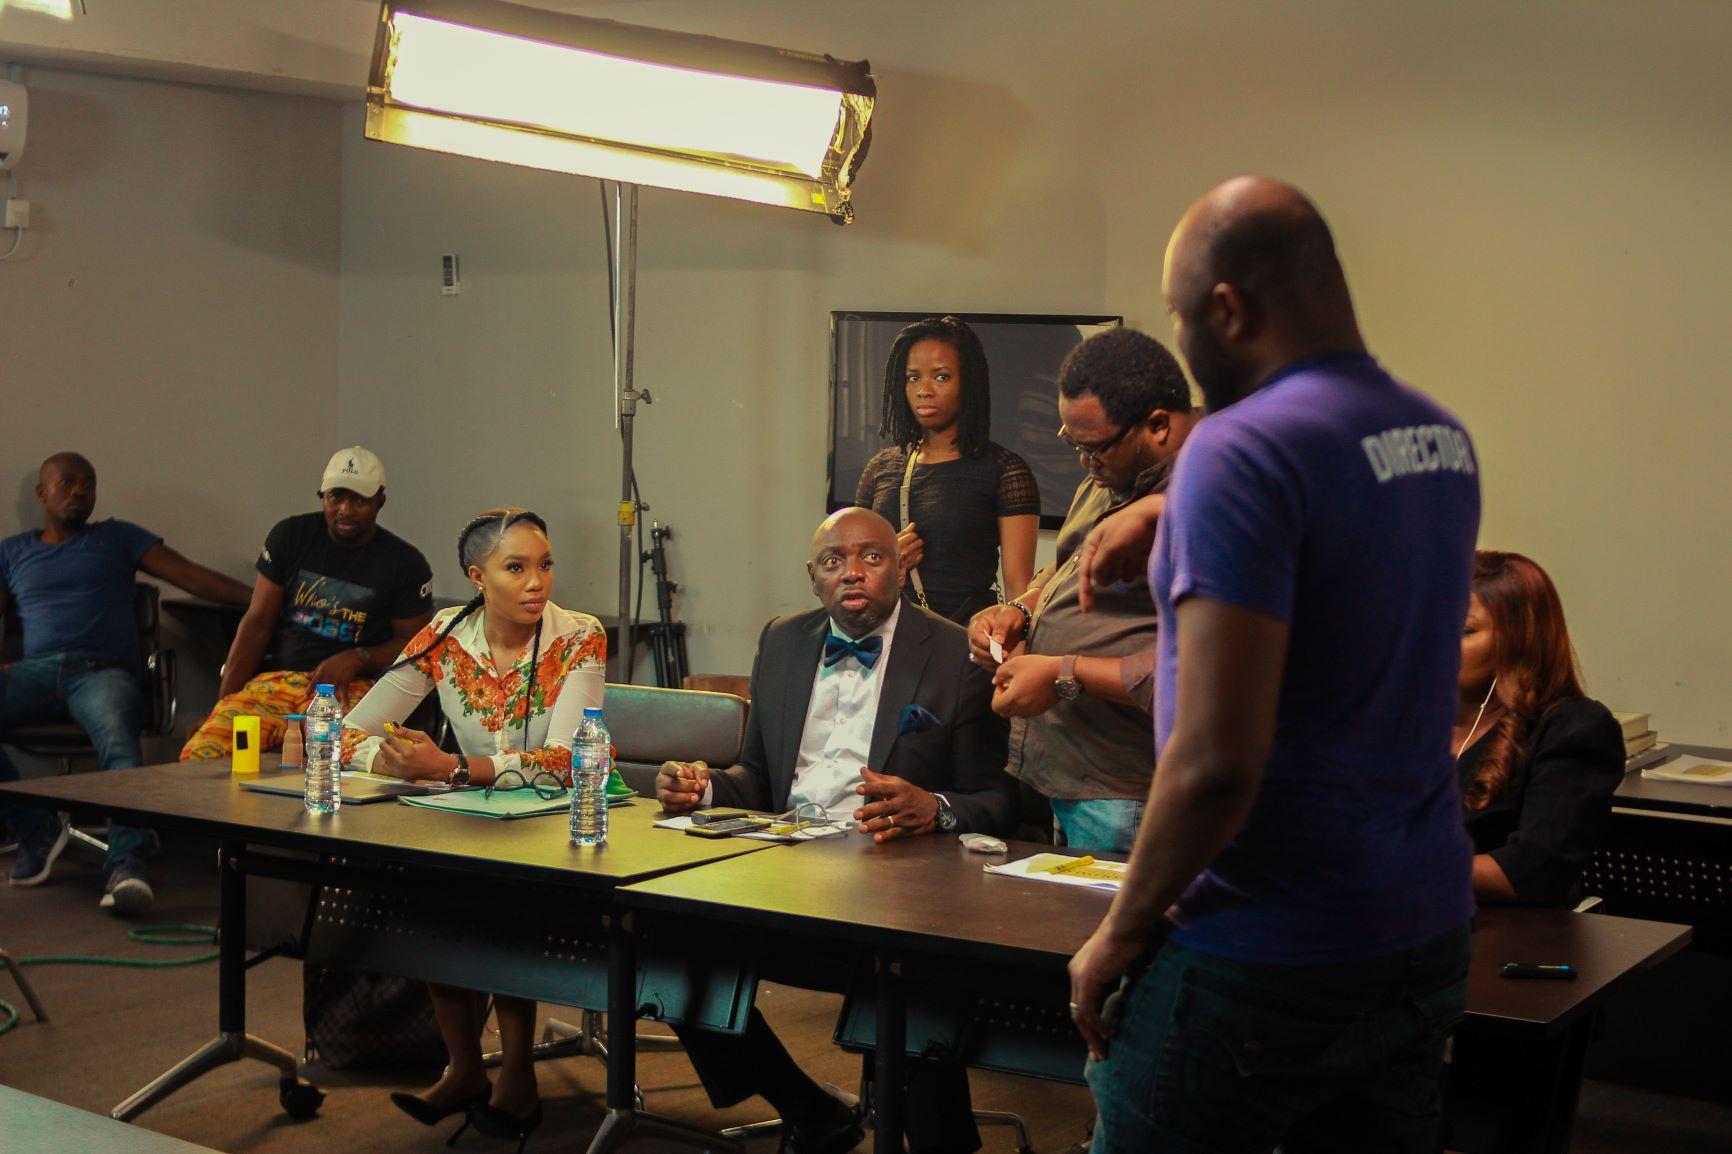 Teaser: INKBLOT teams up with Funke Akindele Bello for Chinaza Onuzo